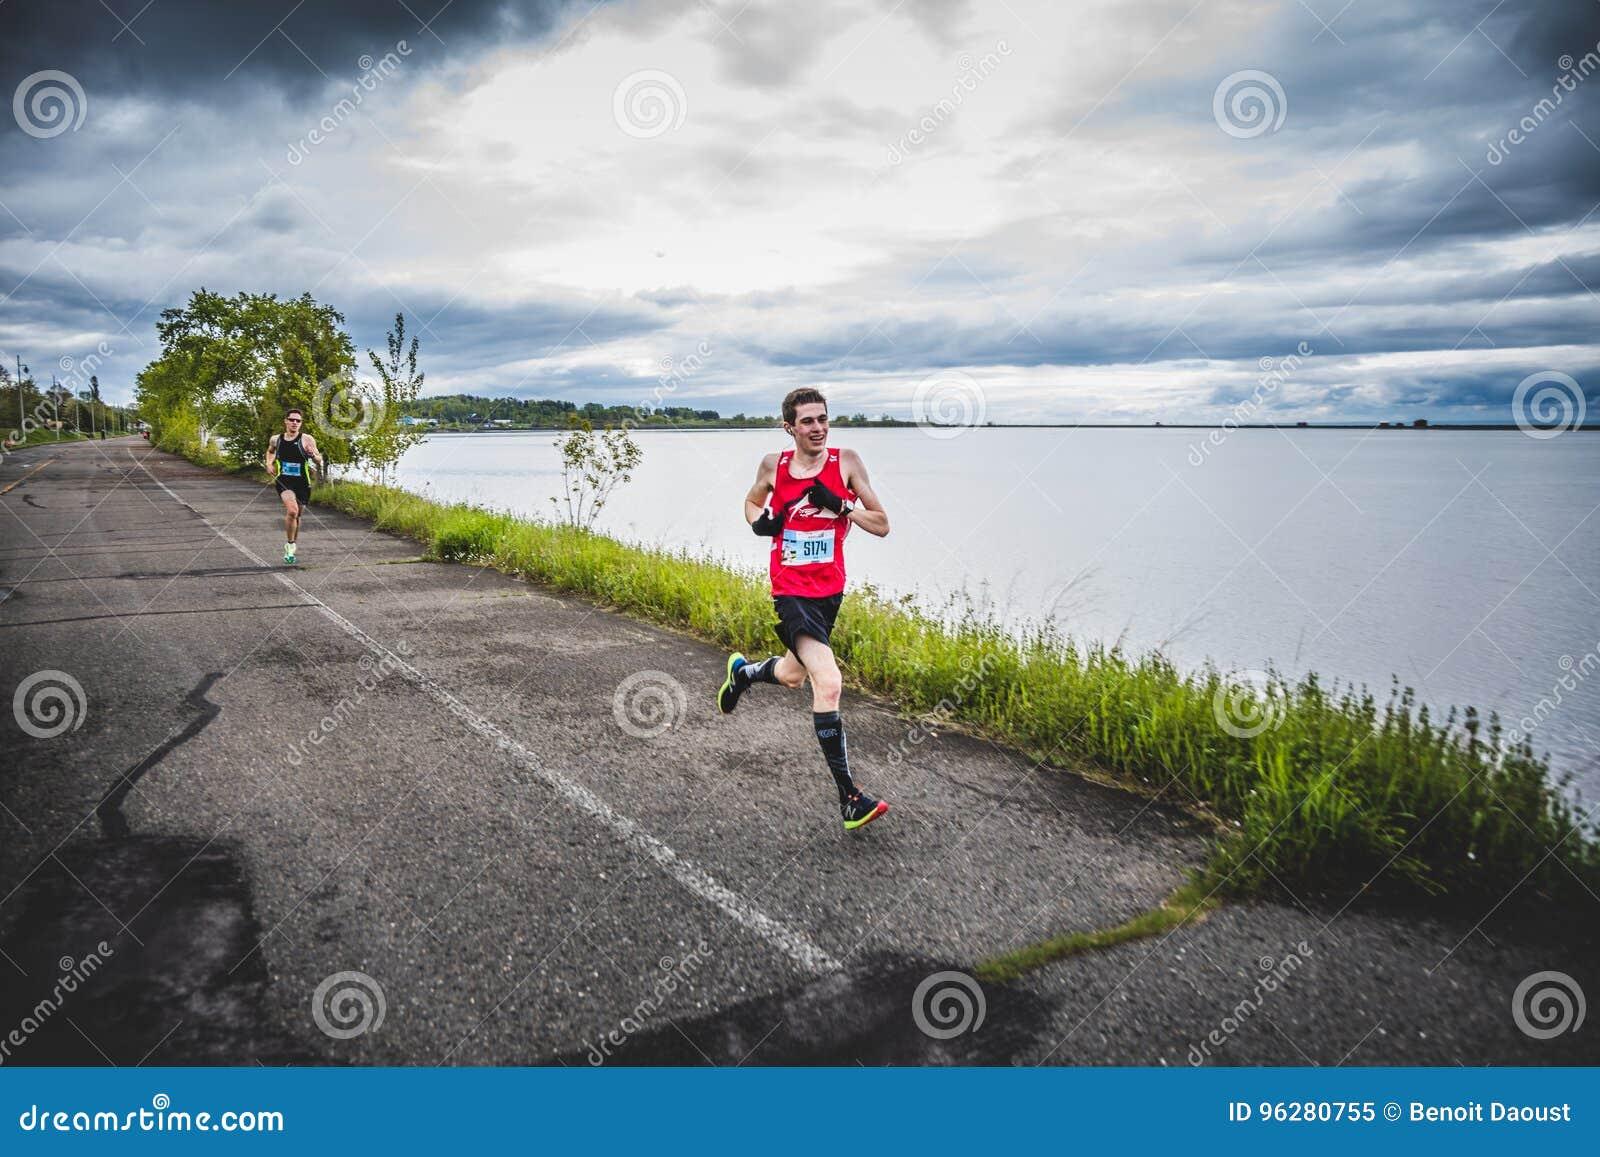 Man Marathoner Sprinting the last 500m before the Finish Line